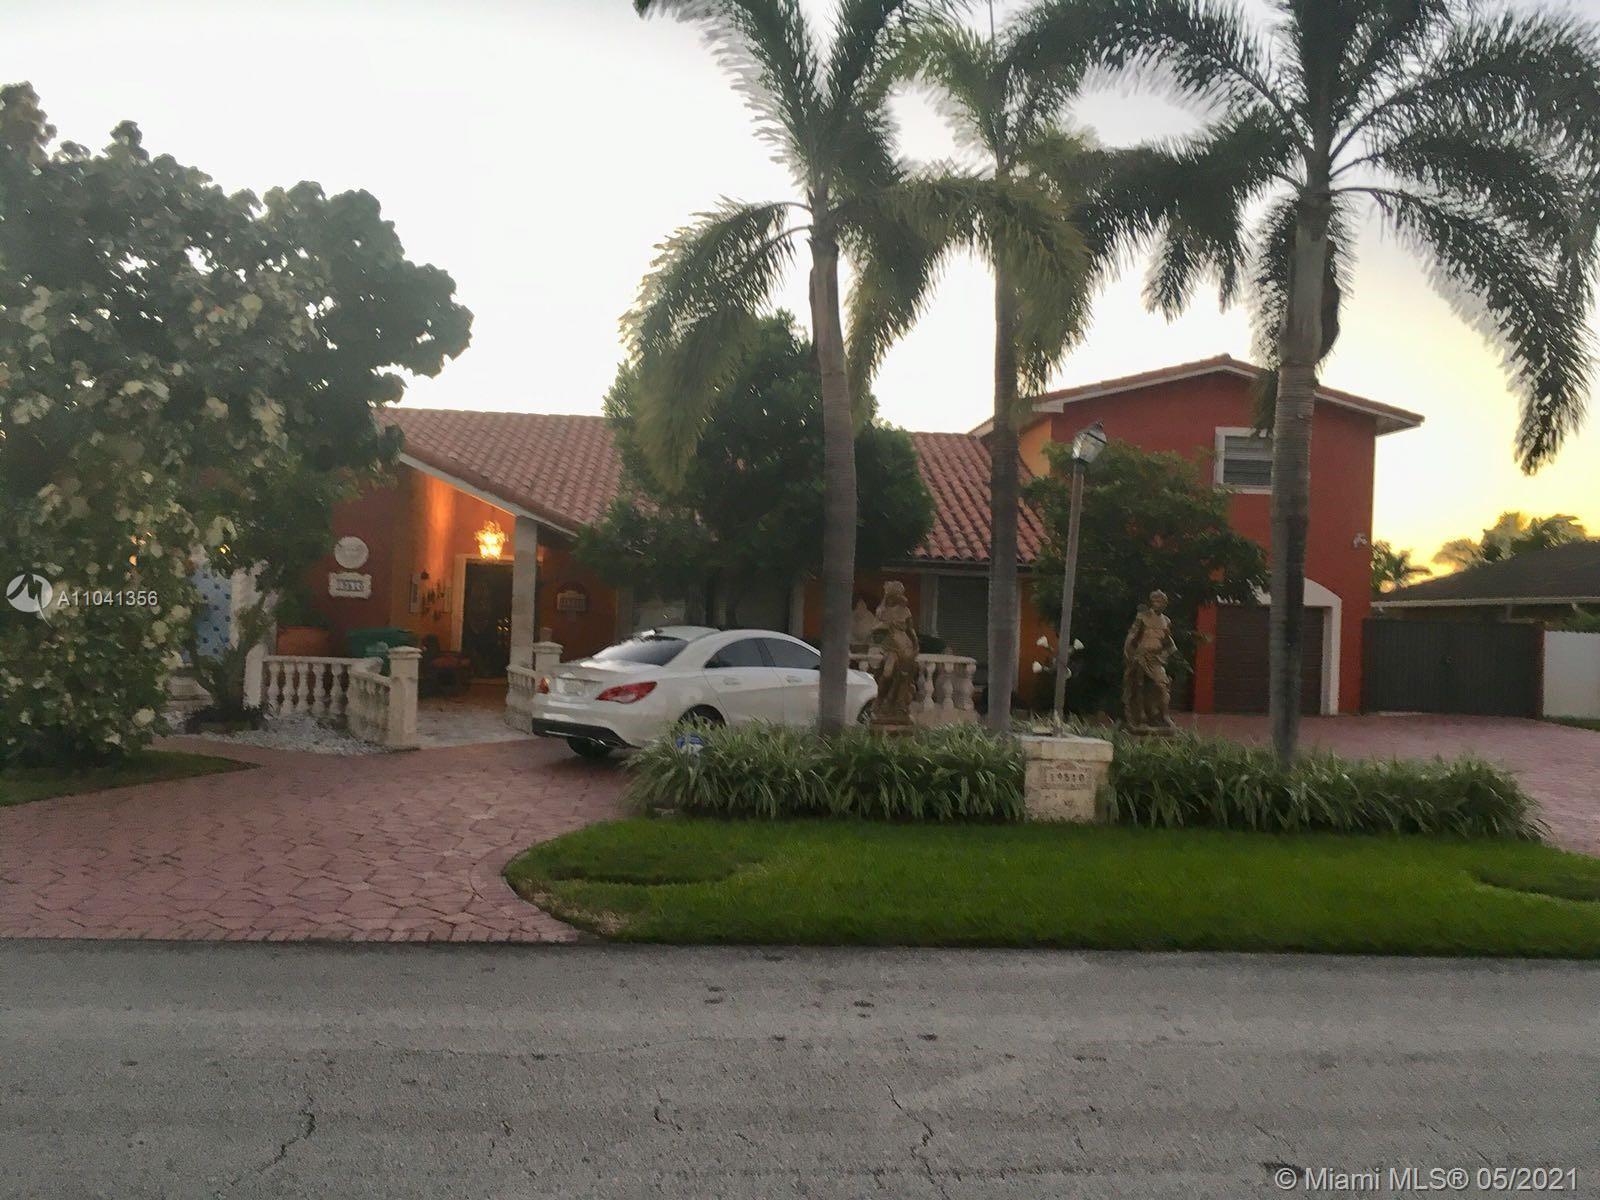 Country Club Of Miam - 19510 W OAKMONT, Hialeah, FL 33015